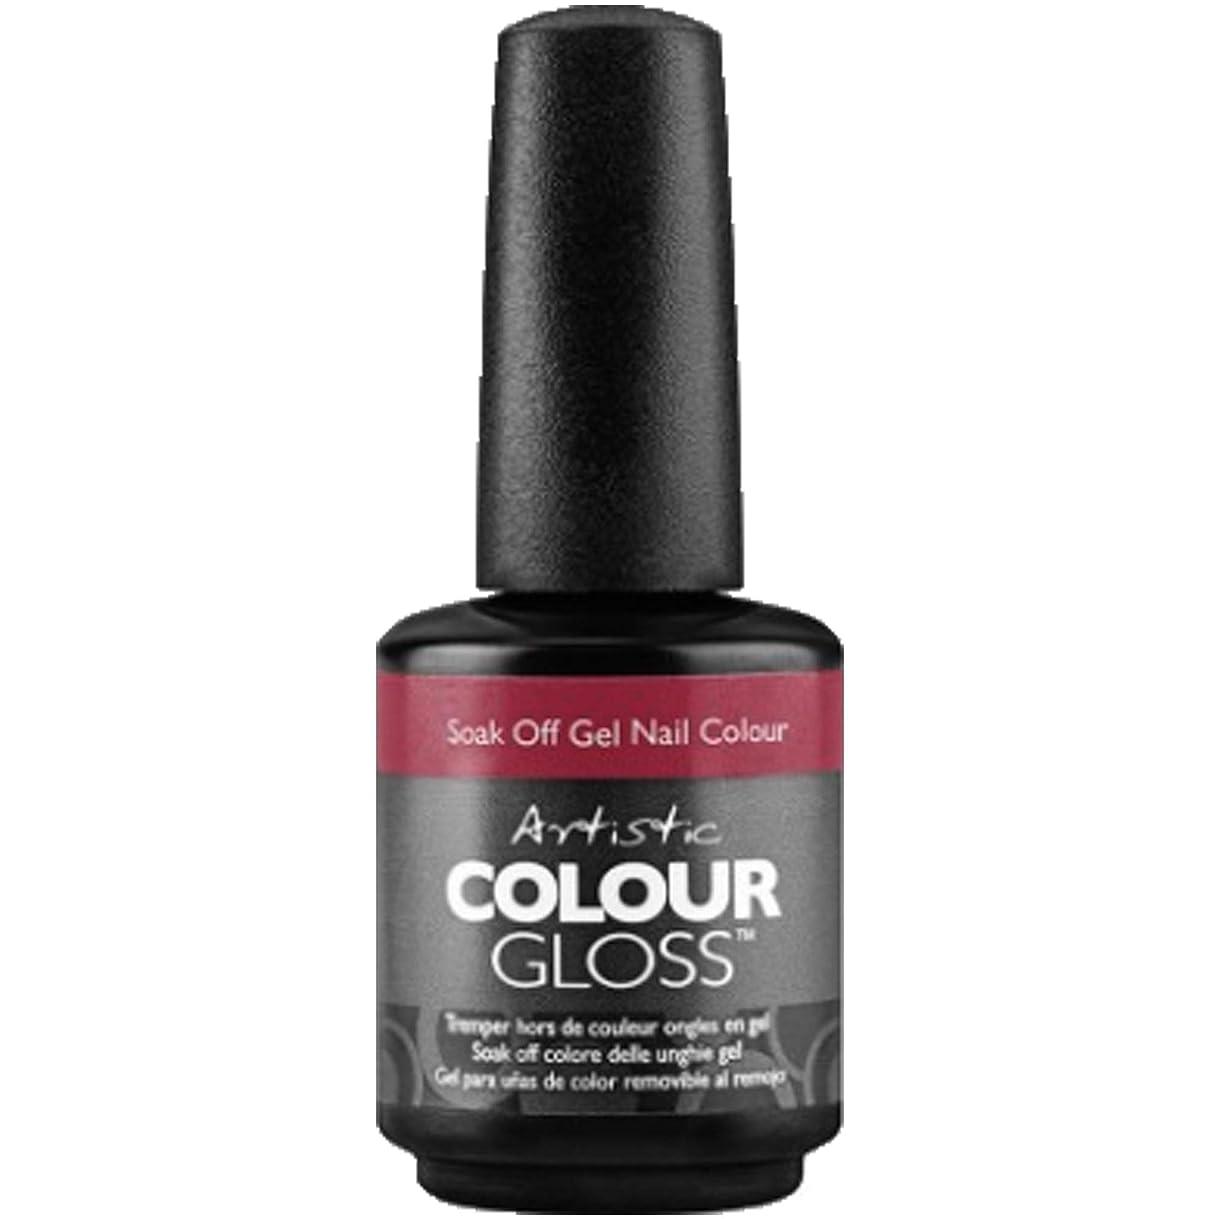 Artistic Colour Gloss - I Wear the Pants - 0.5oz / 15ml